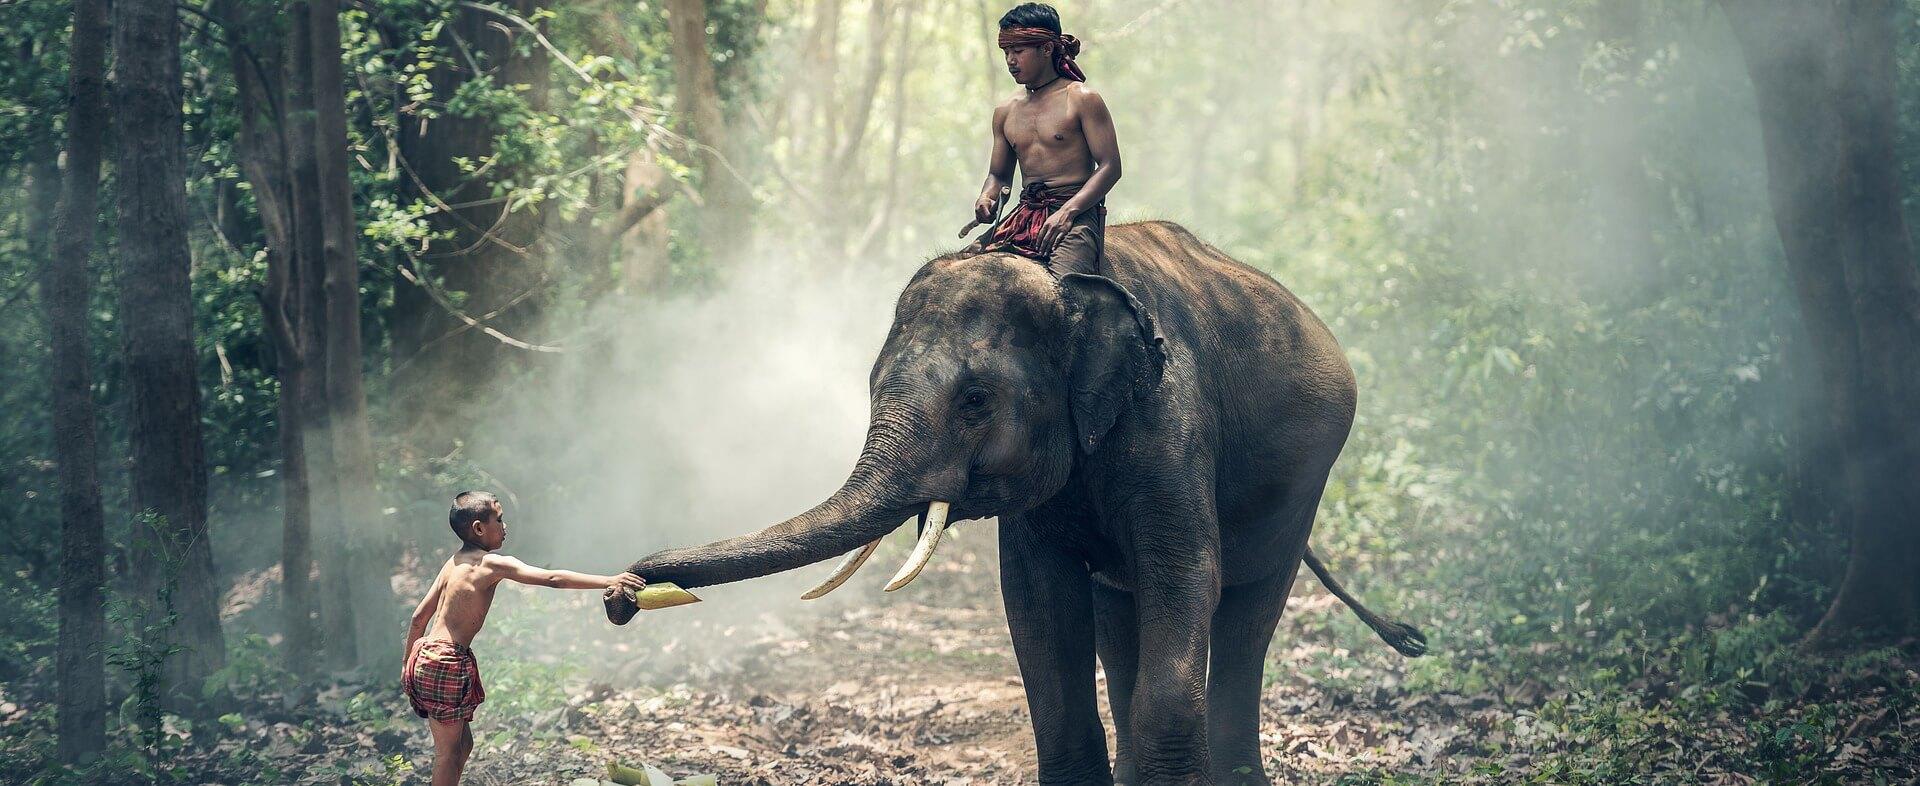 Les activités à faire au Cambodge - Cambodge